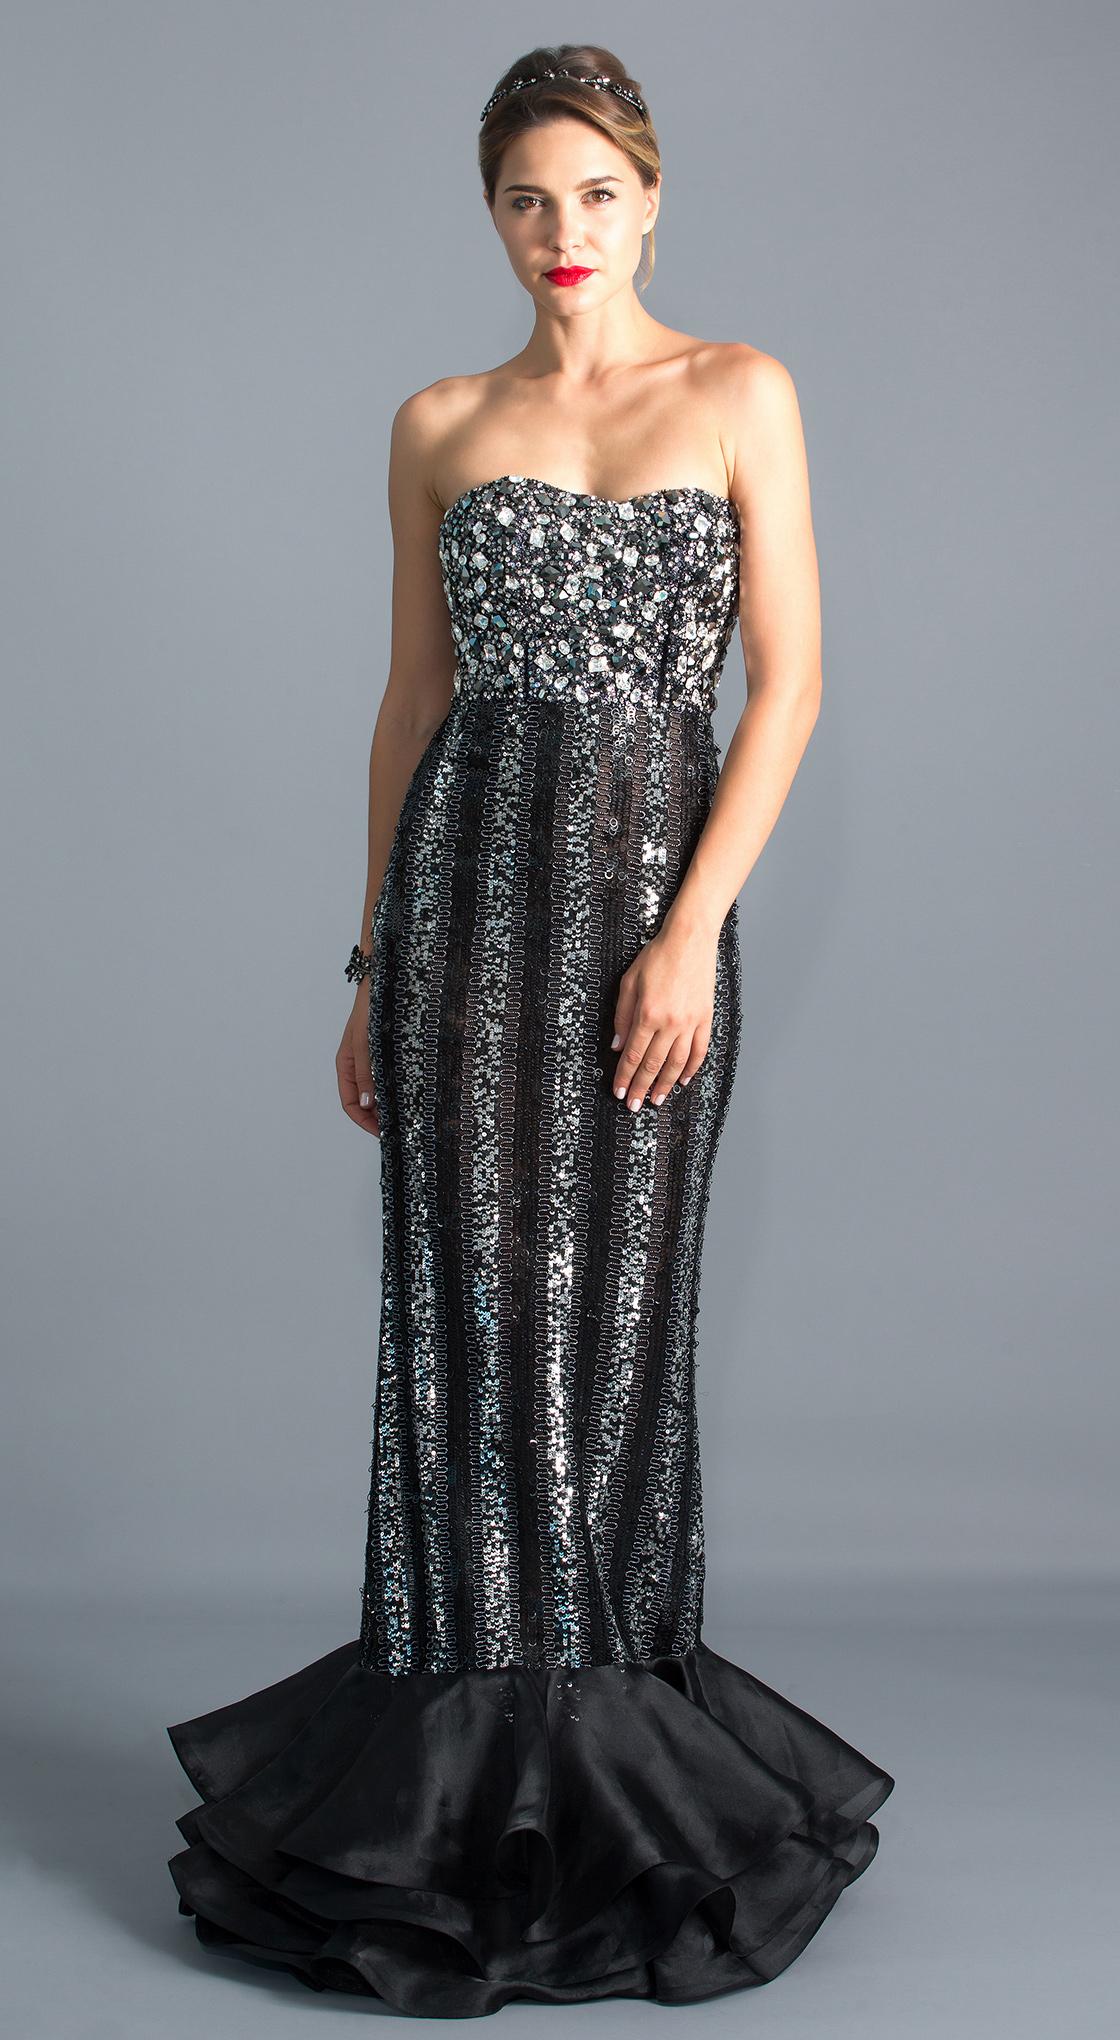 98e5e991456f Rent MAISON ELEGANCE HAUTE COUTURE Beaded Mermaid Gown in Dubai ...